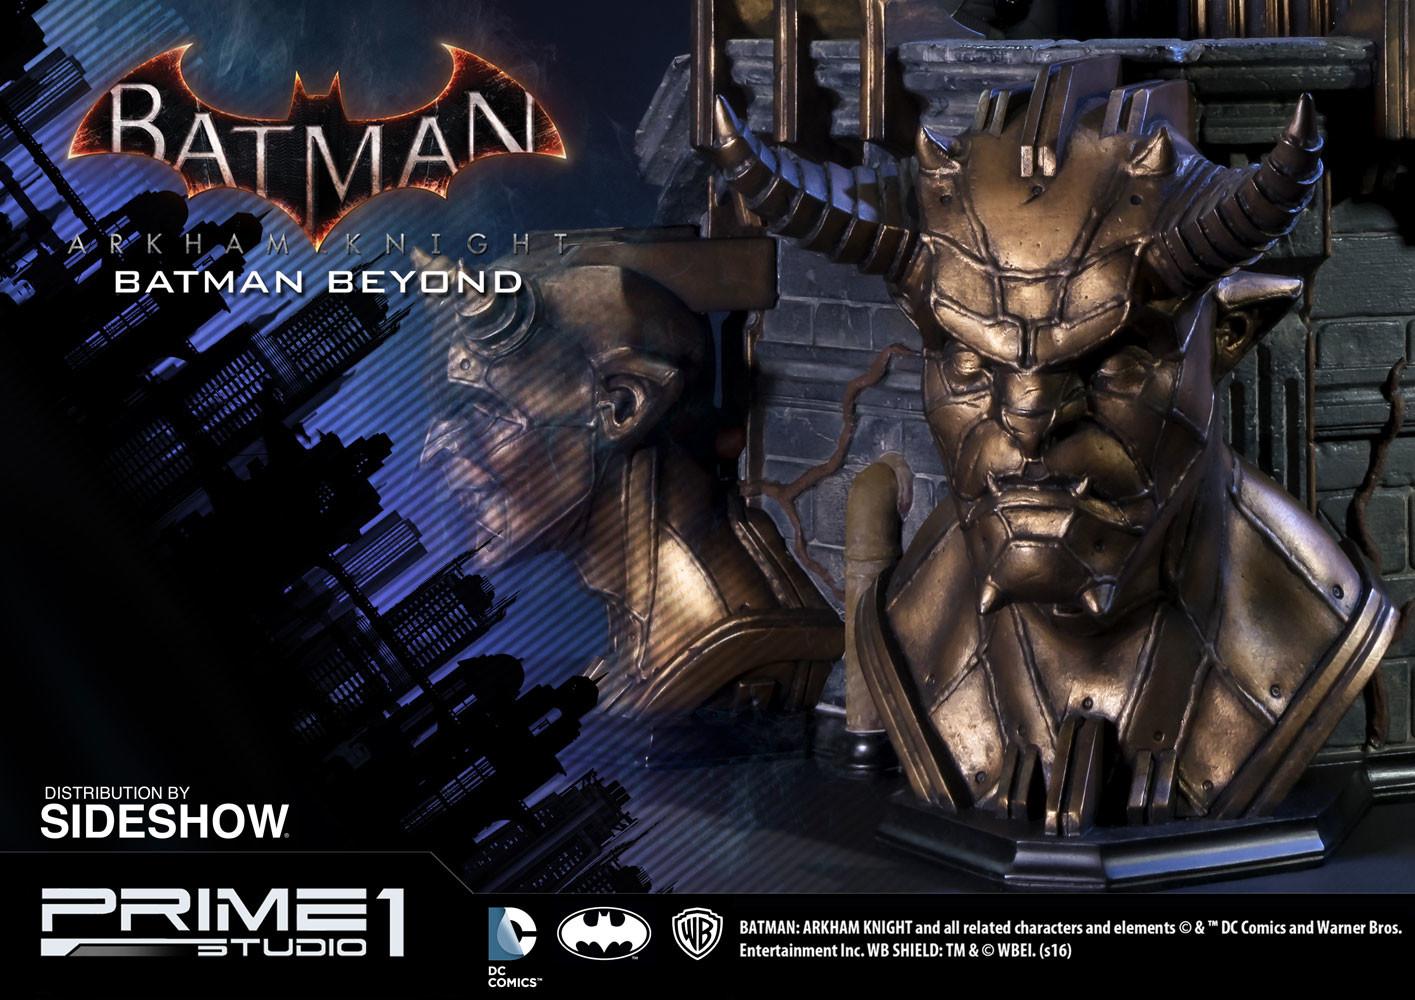 Alvaro ribeiro dc comics batman arkham knight batman beyond statue prime 1 studio 902683 22